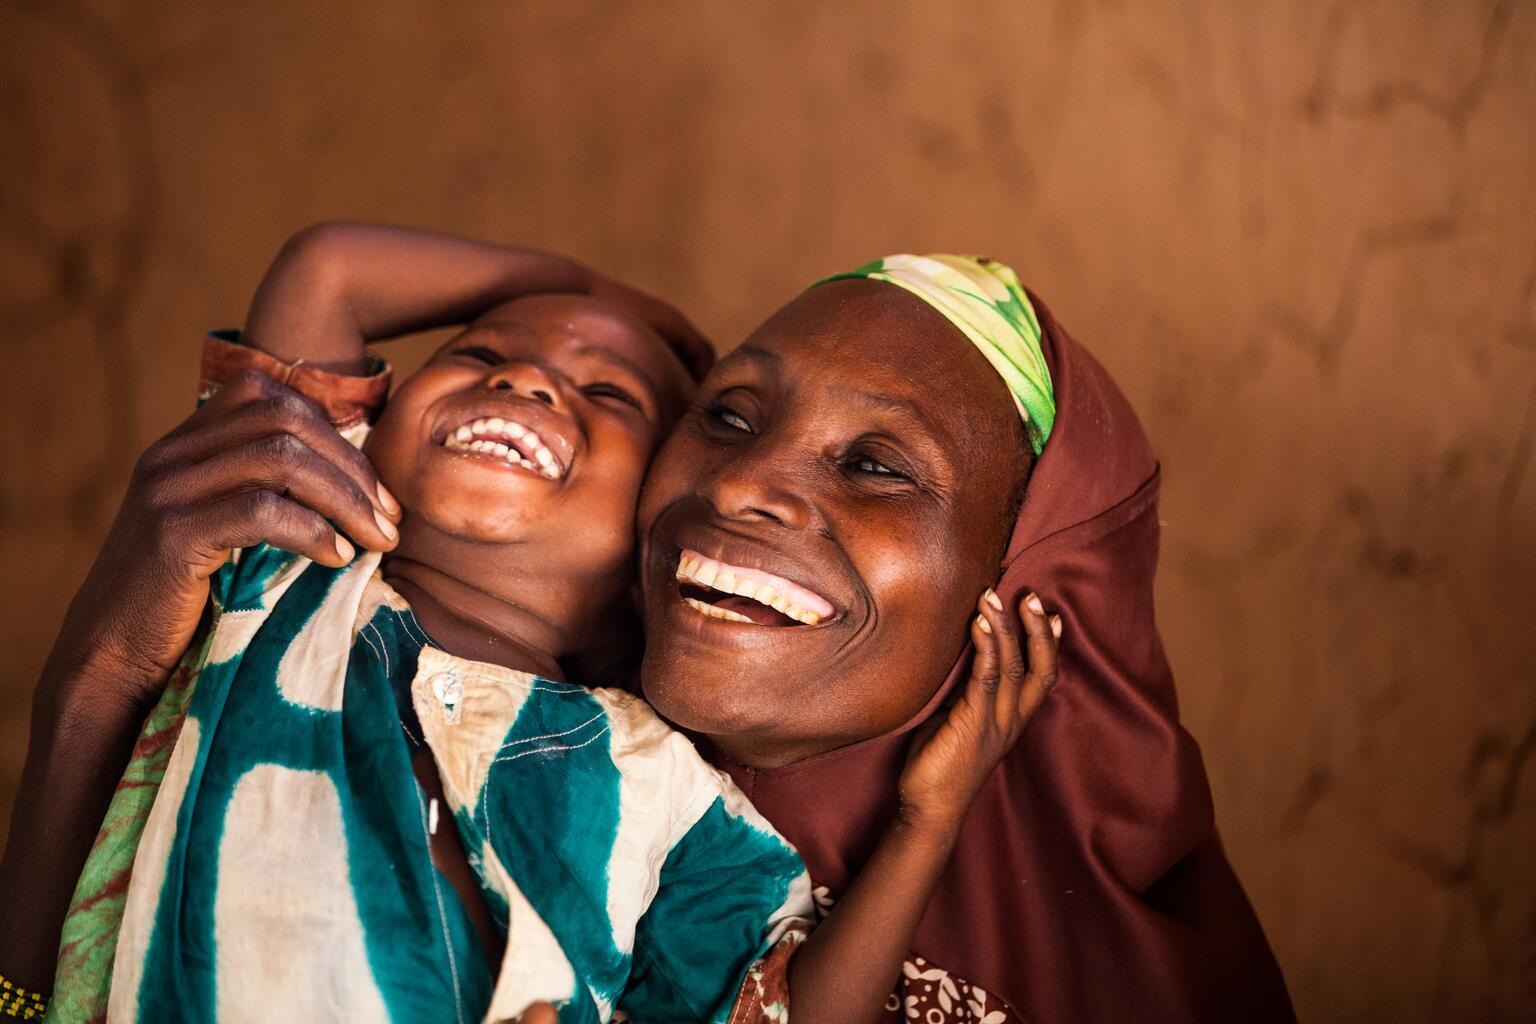 Bild zu Kind, Mutter, Sierra Leone, Afrika